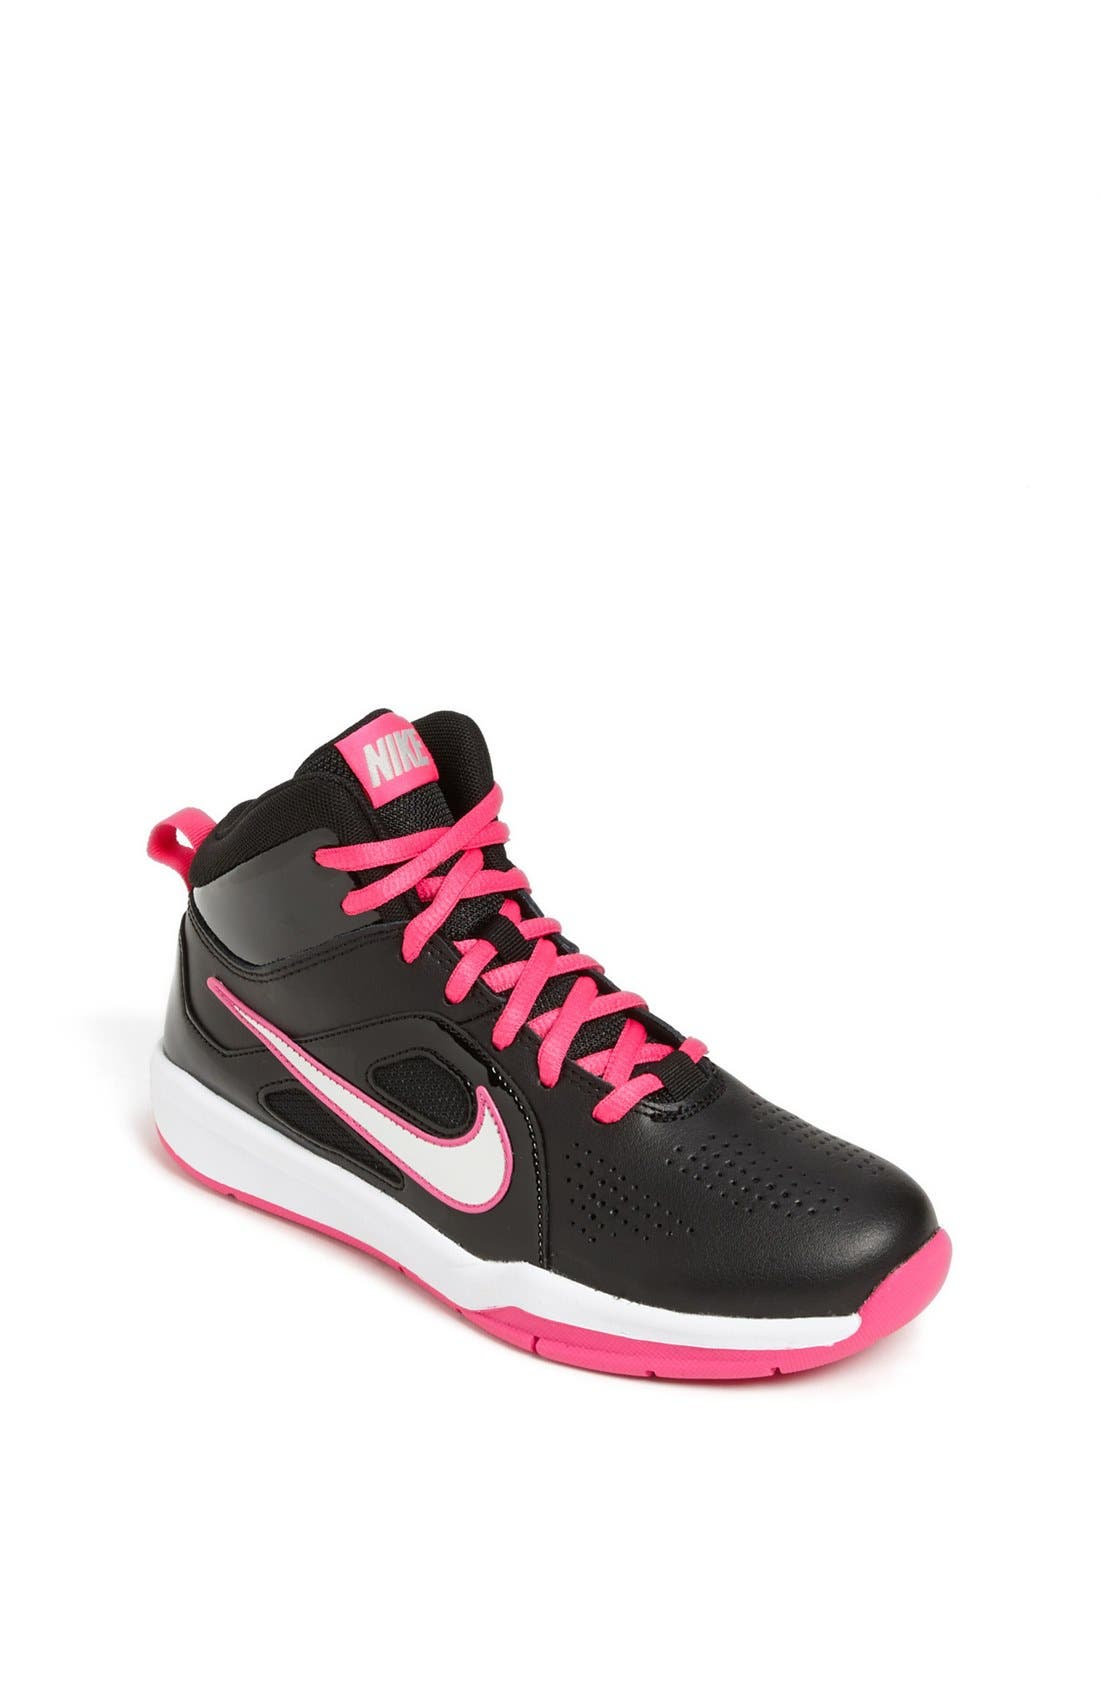 Alternate Image 1 Selected - Nike 'Team Hustle' Basketball Shoe (Toddler, Little Kid & Big Kid)